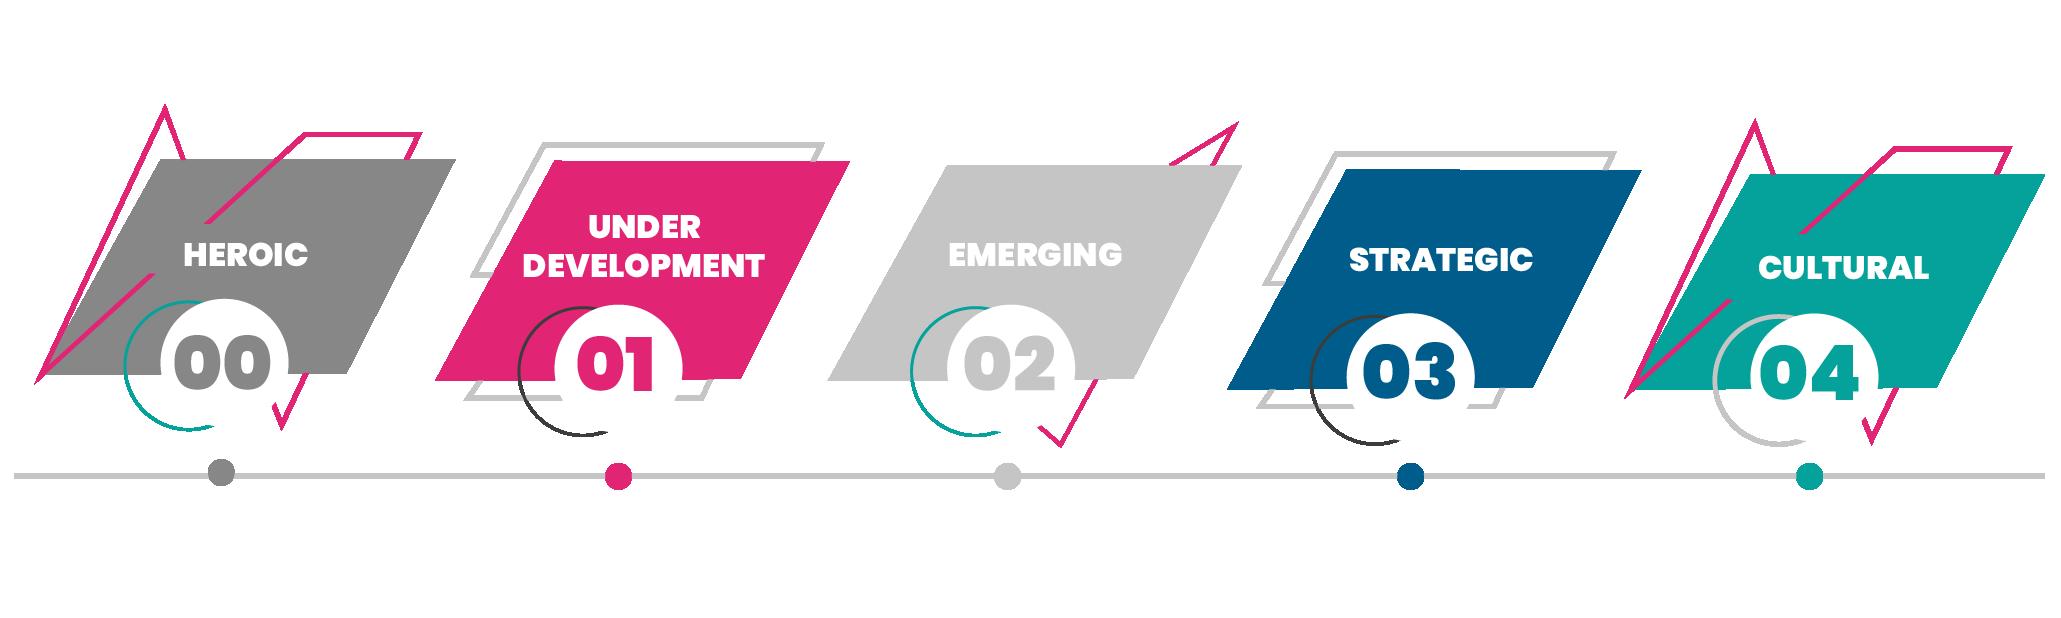 innovacion-icon.png